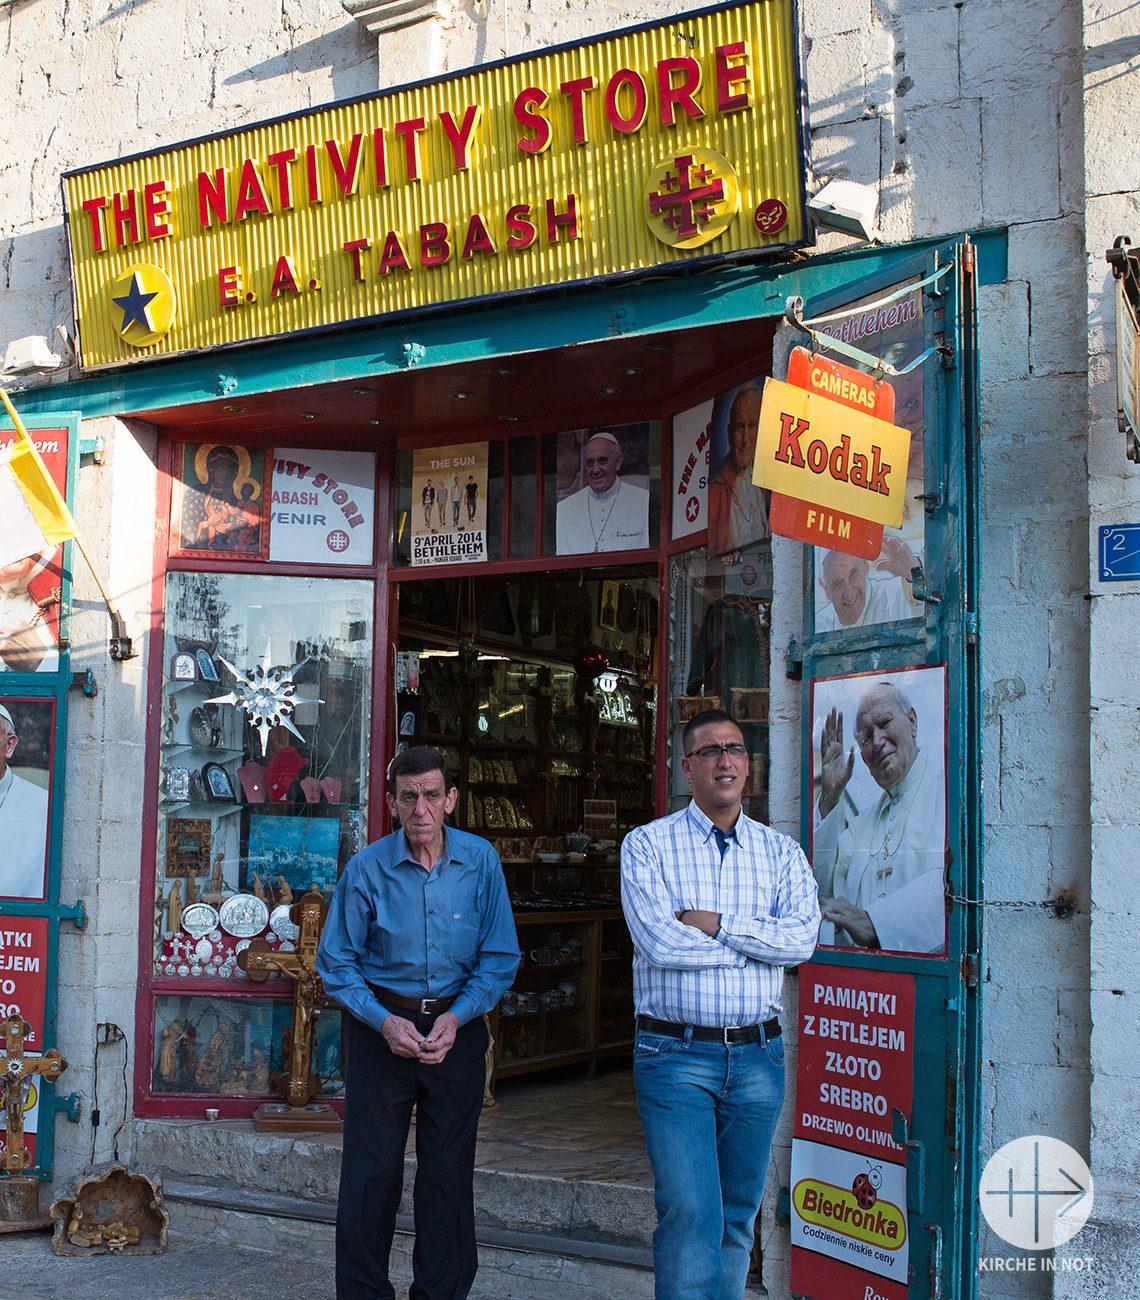 Bethlehem Tabash Geschäft